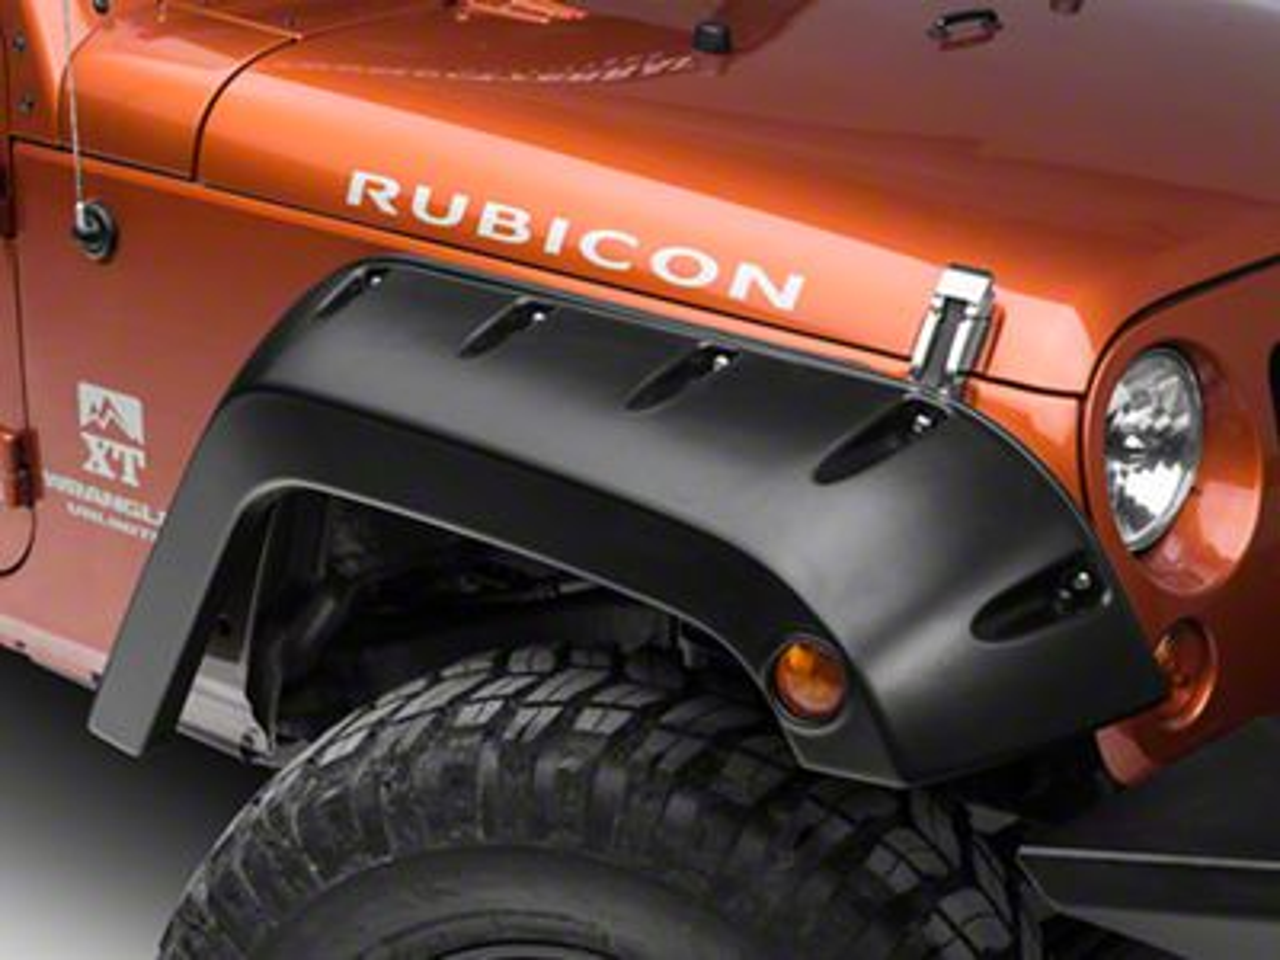 Bushwacker Factory Width Pocket Style Fender Flares (07-18 Jeep Wrangler JK)